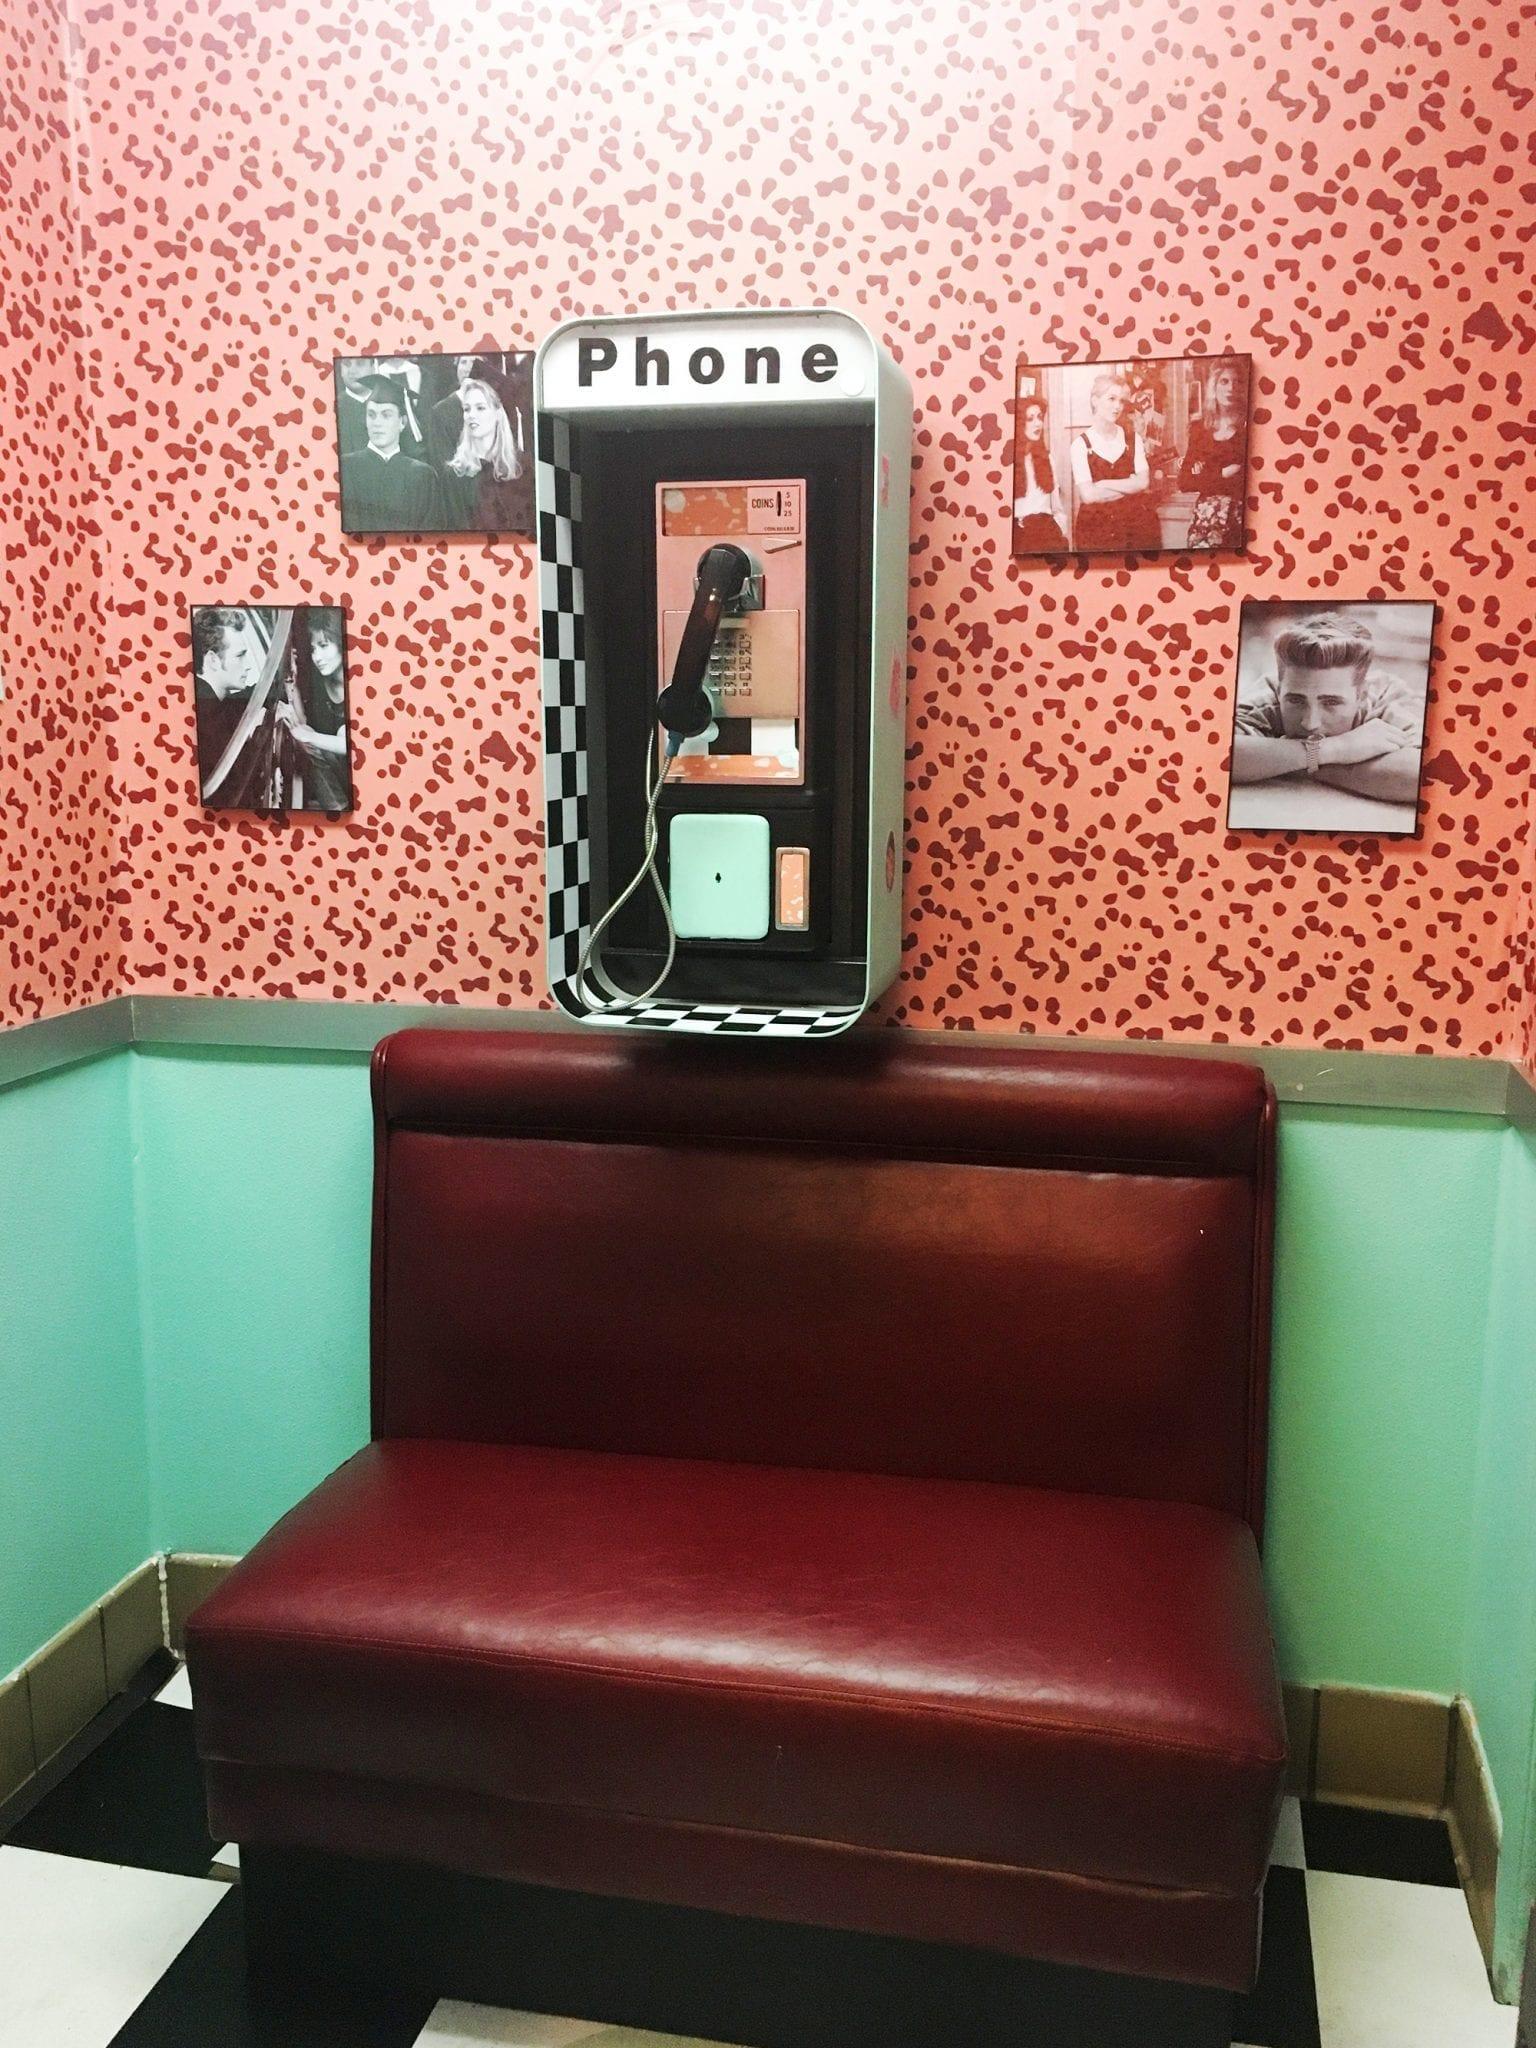 peach pit phone booth